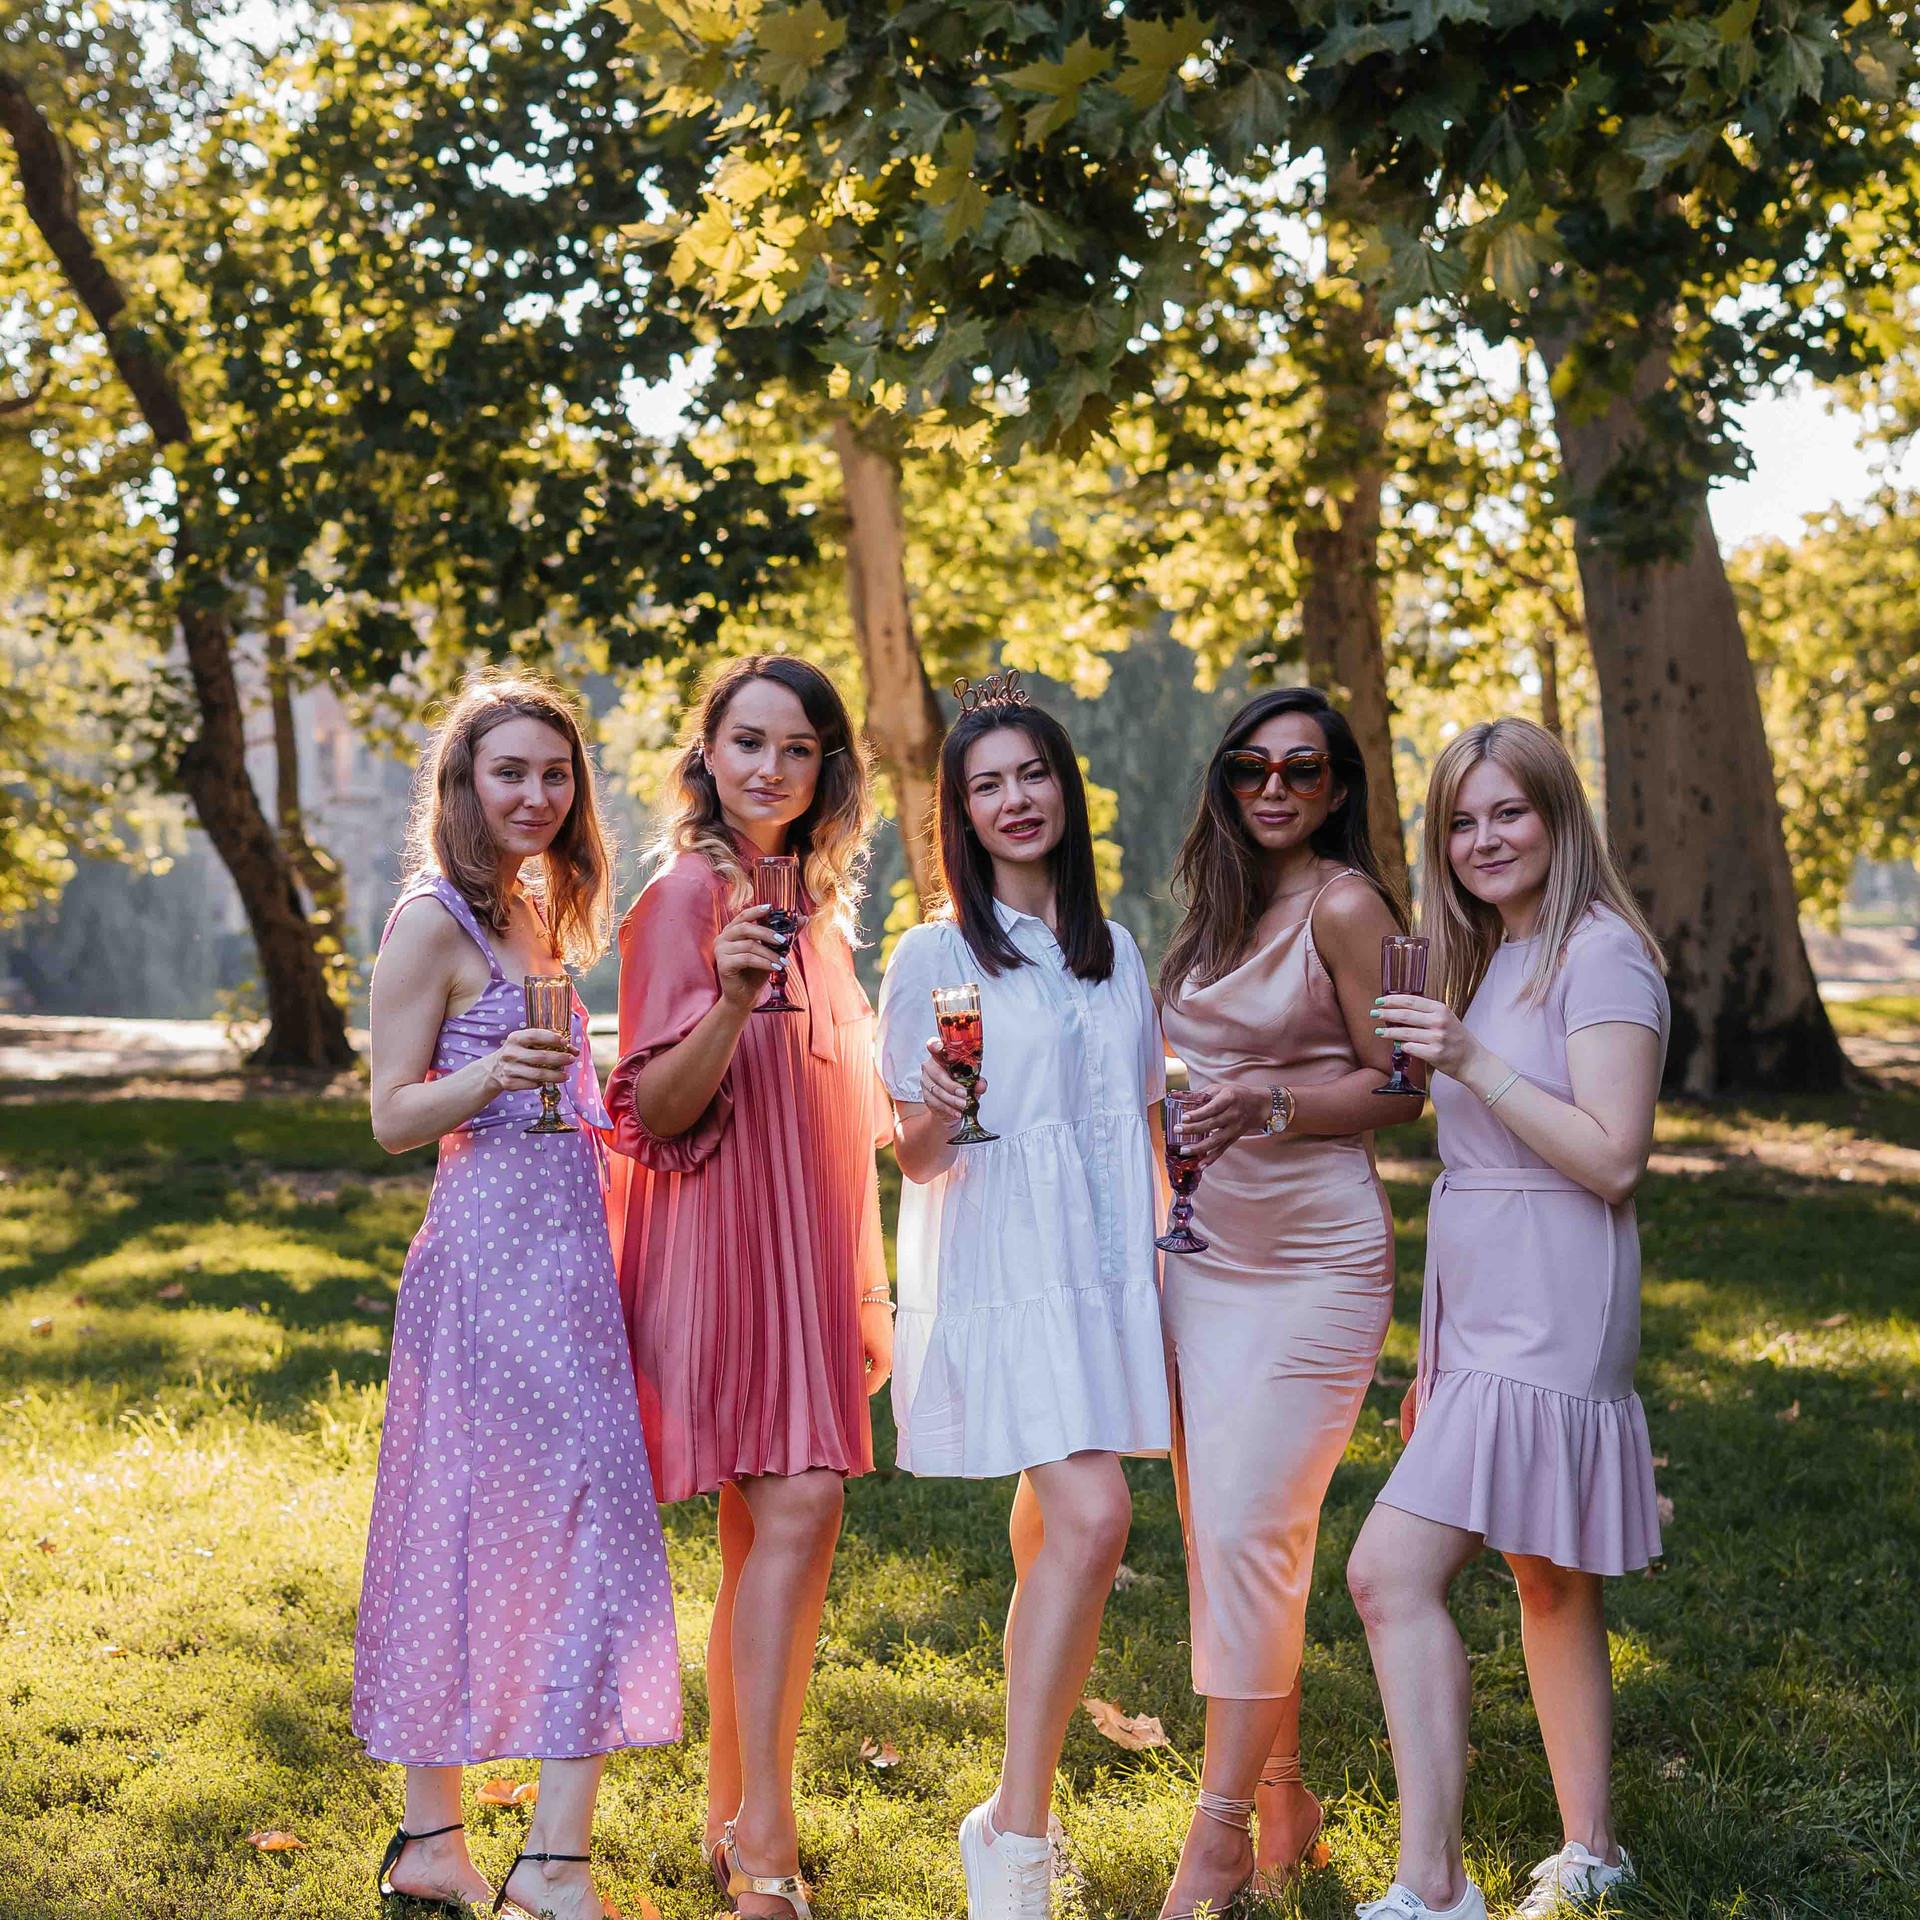 bachelorette-party-in-budapest-21.jpg